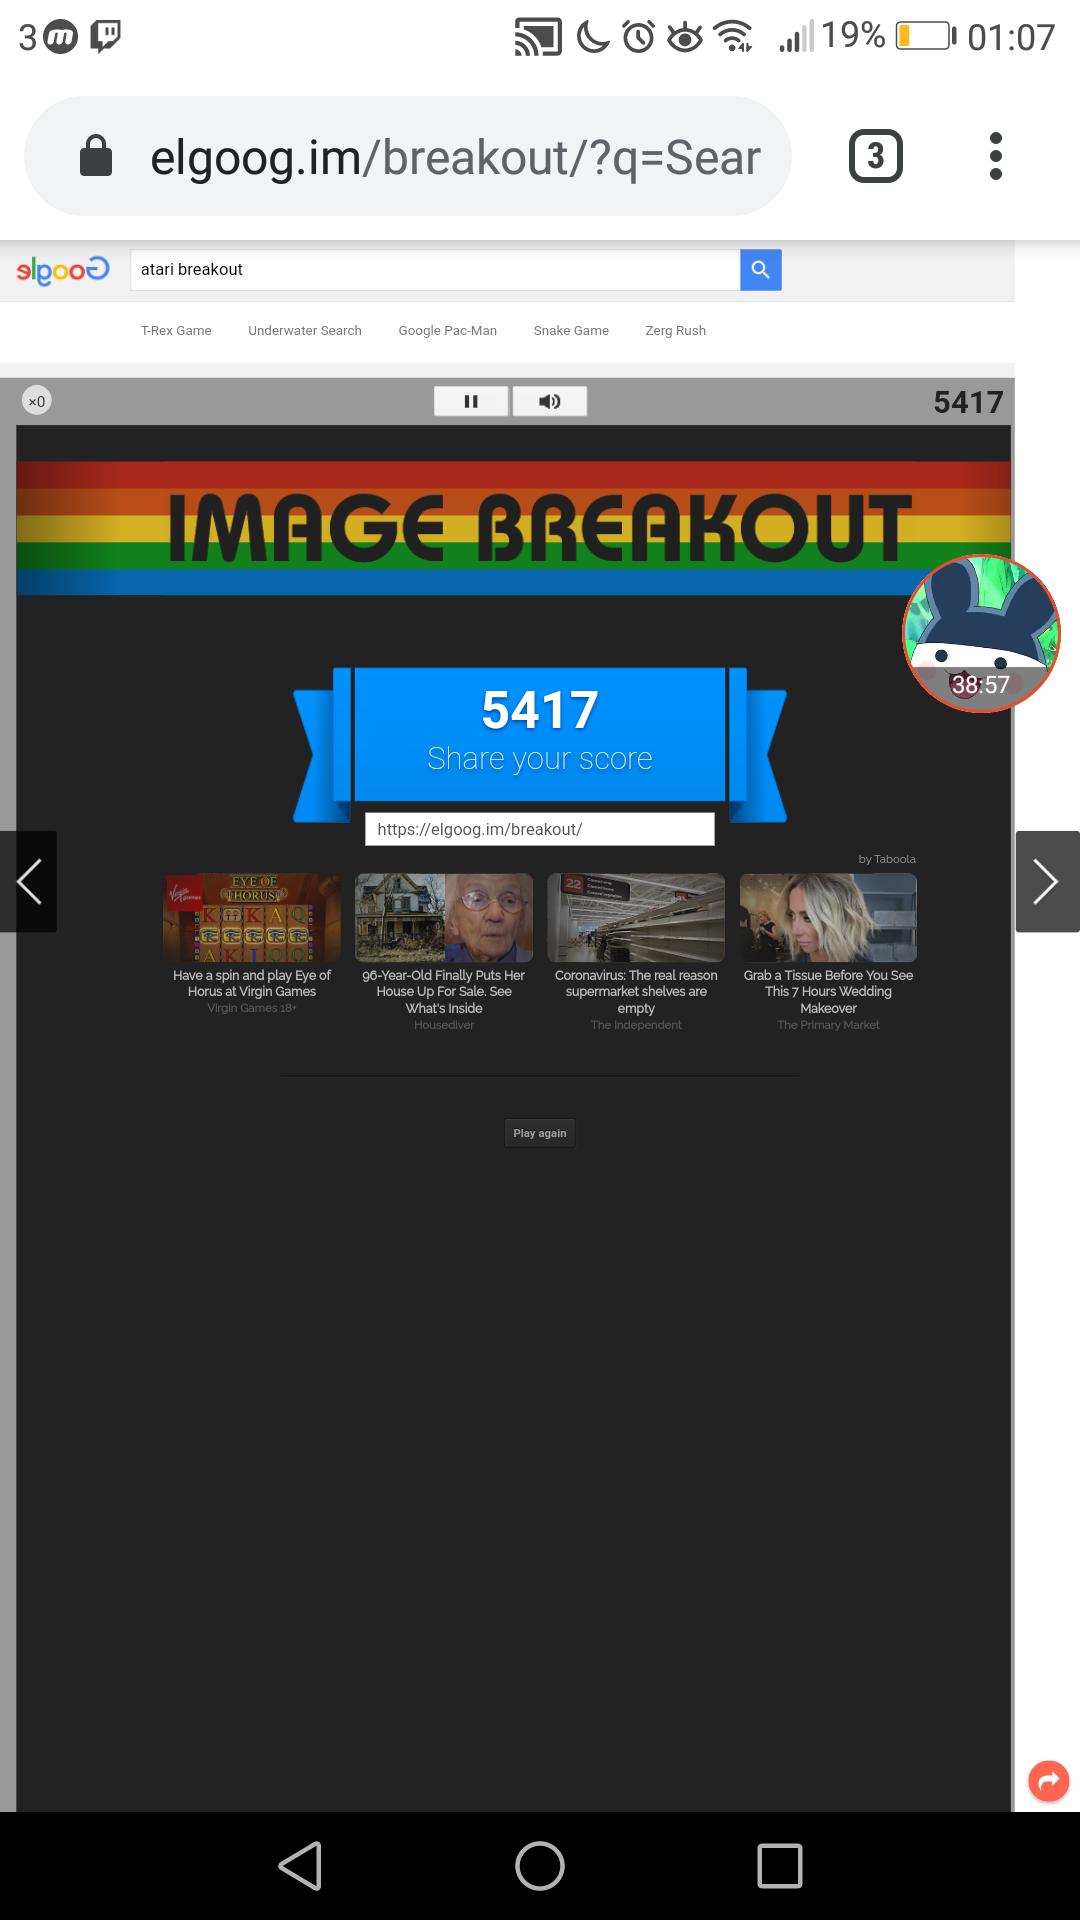 Mimitchi: Google Atari Breakout [Mobile] (Android) 5,417 points on 2020-04-06 02:56:15